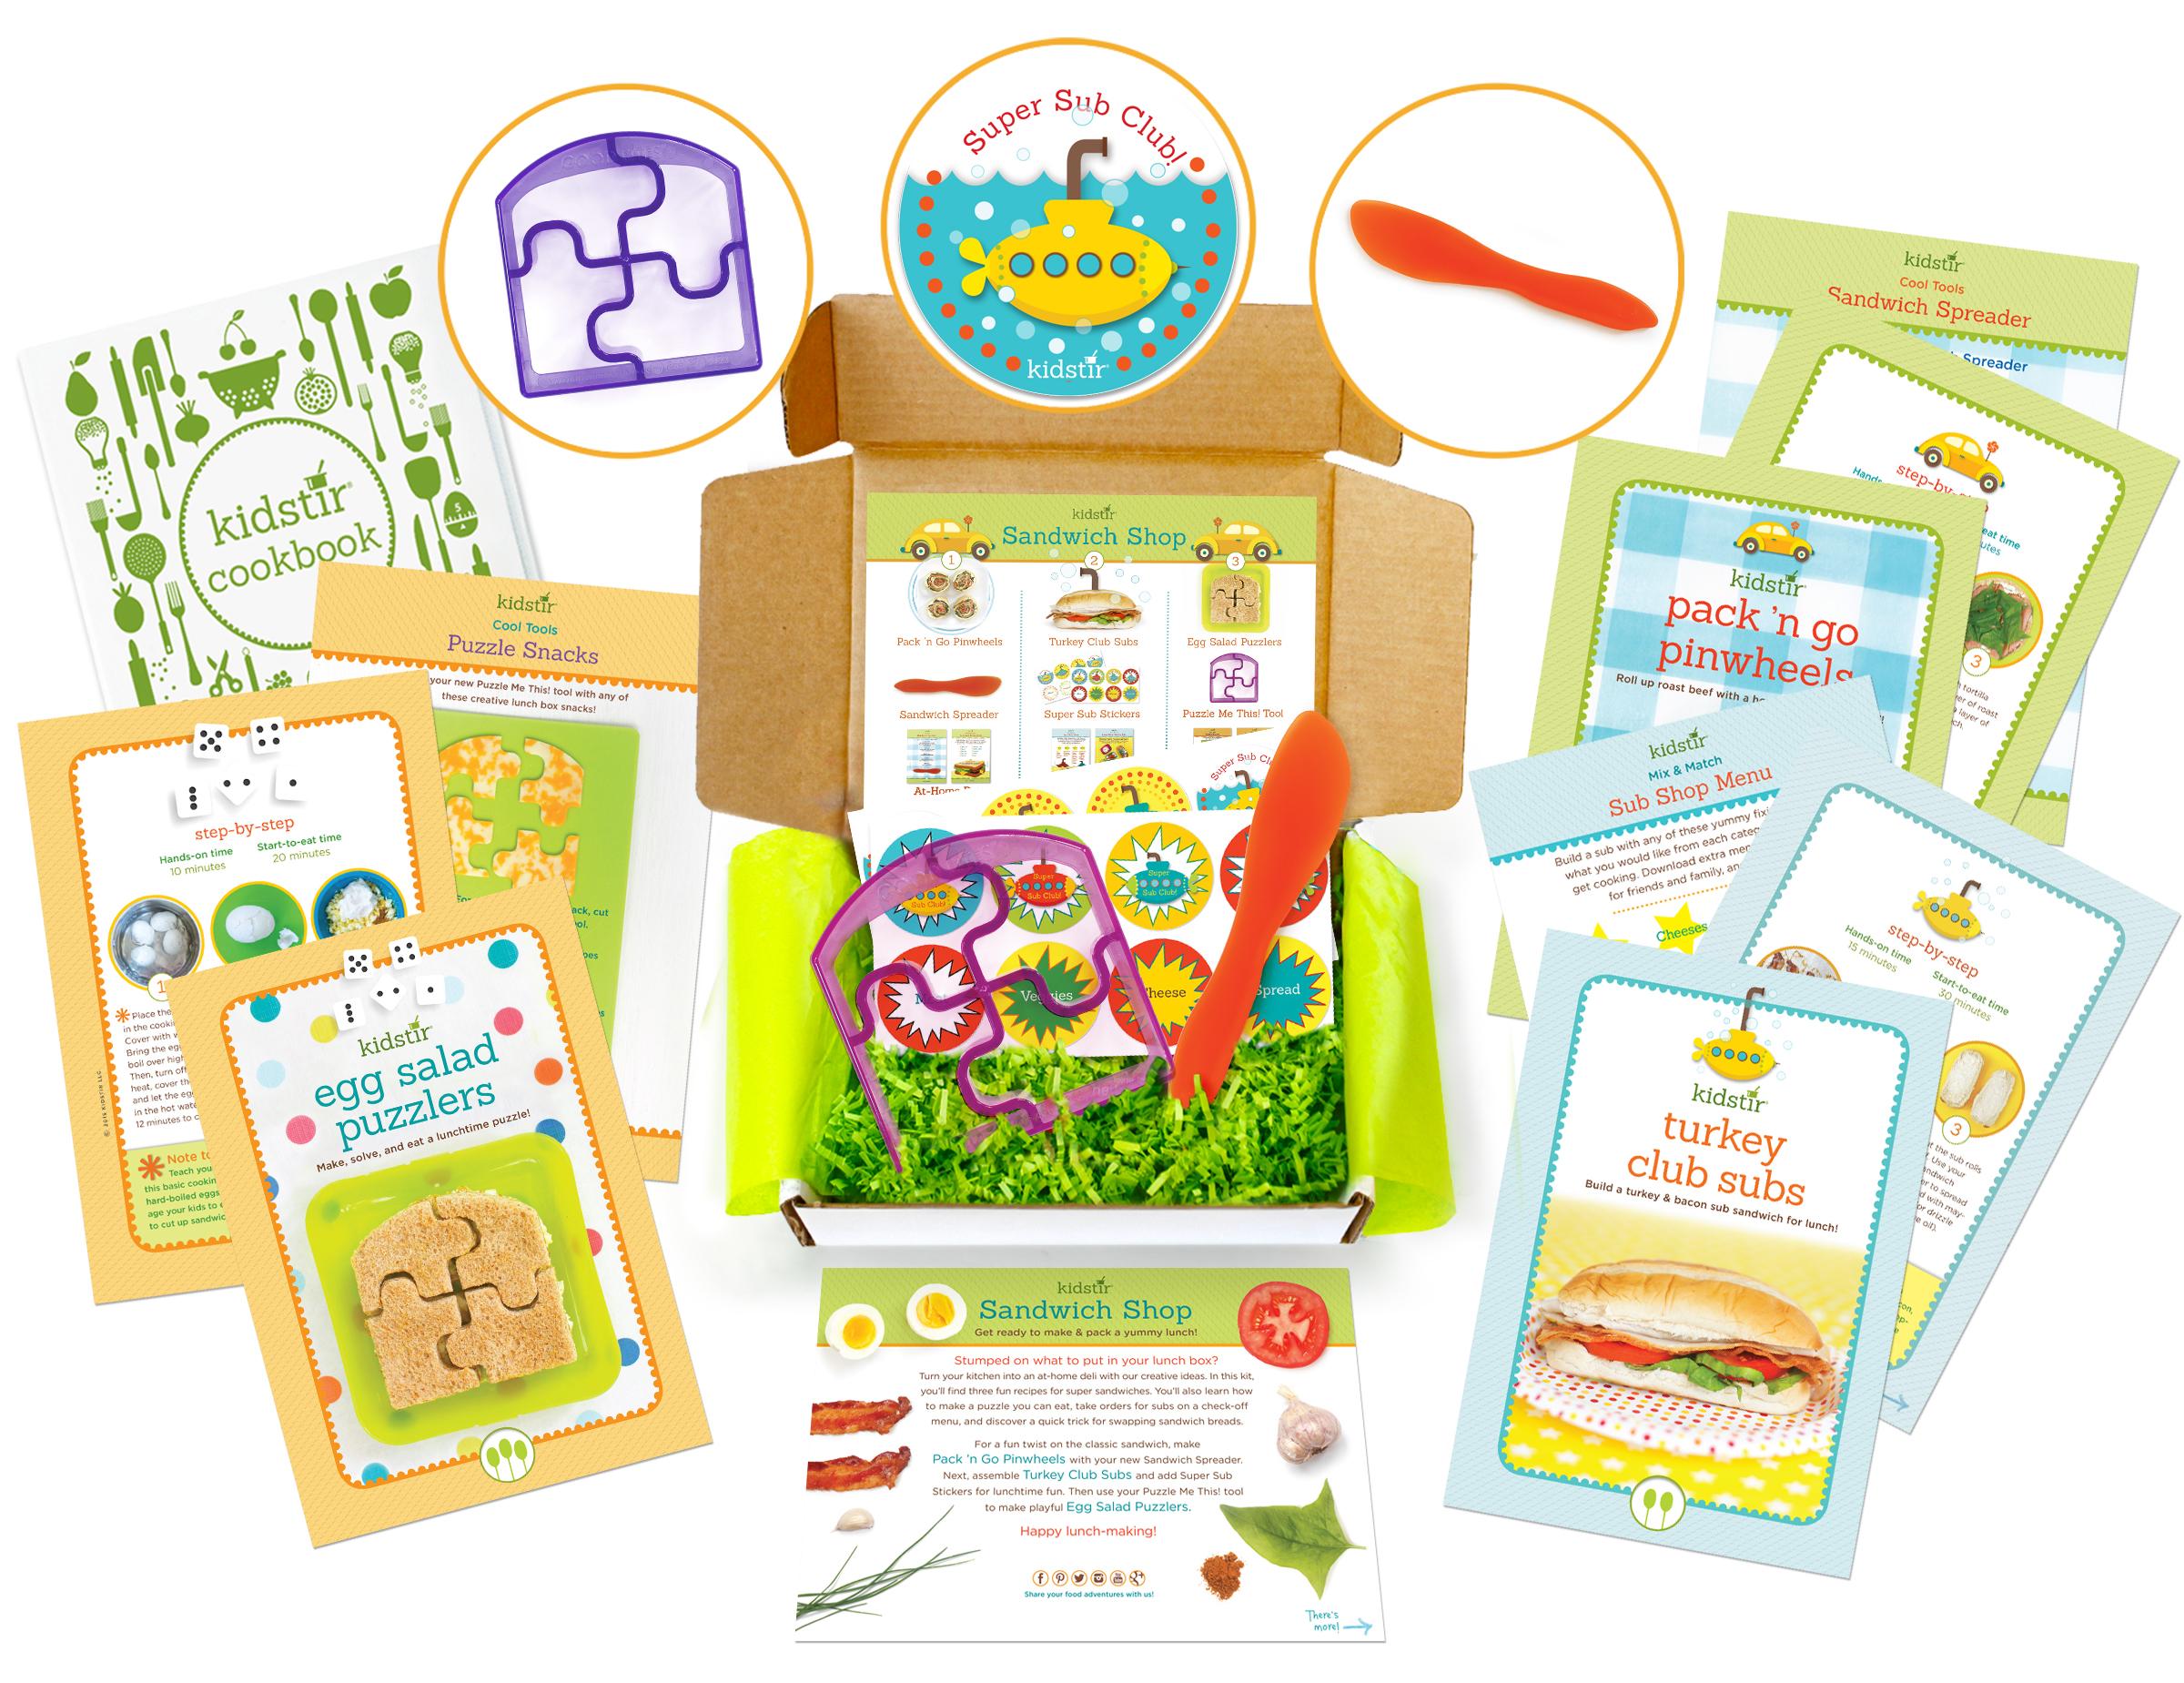 http://kidstir.com/wp-content/uploads/2016/08/Kidstir12_11-Lunch-w-Binder-Box.jpg